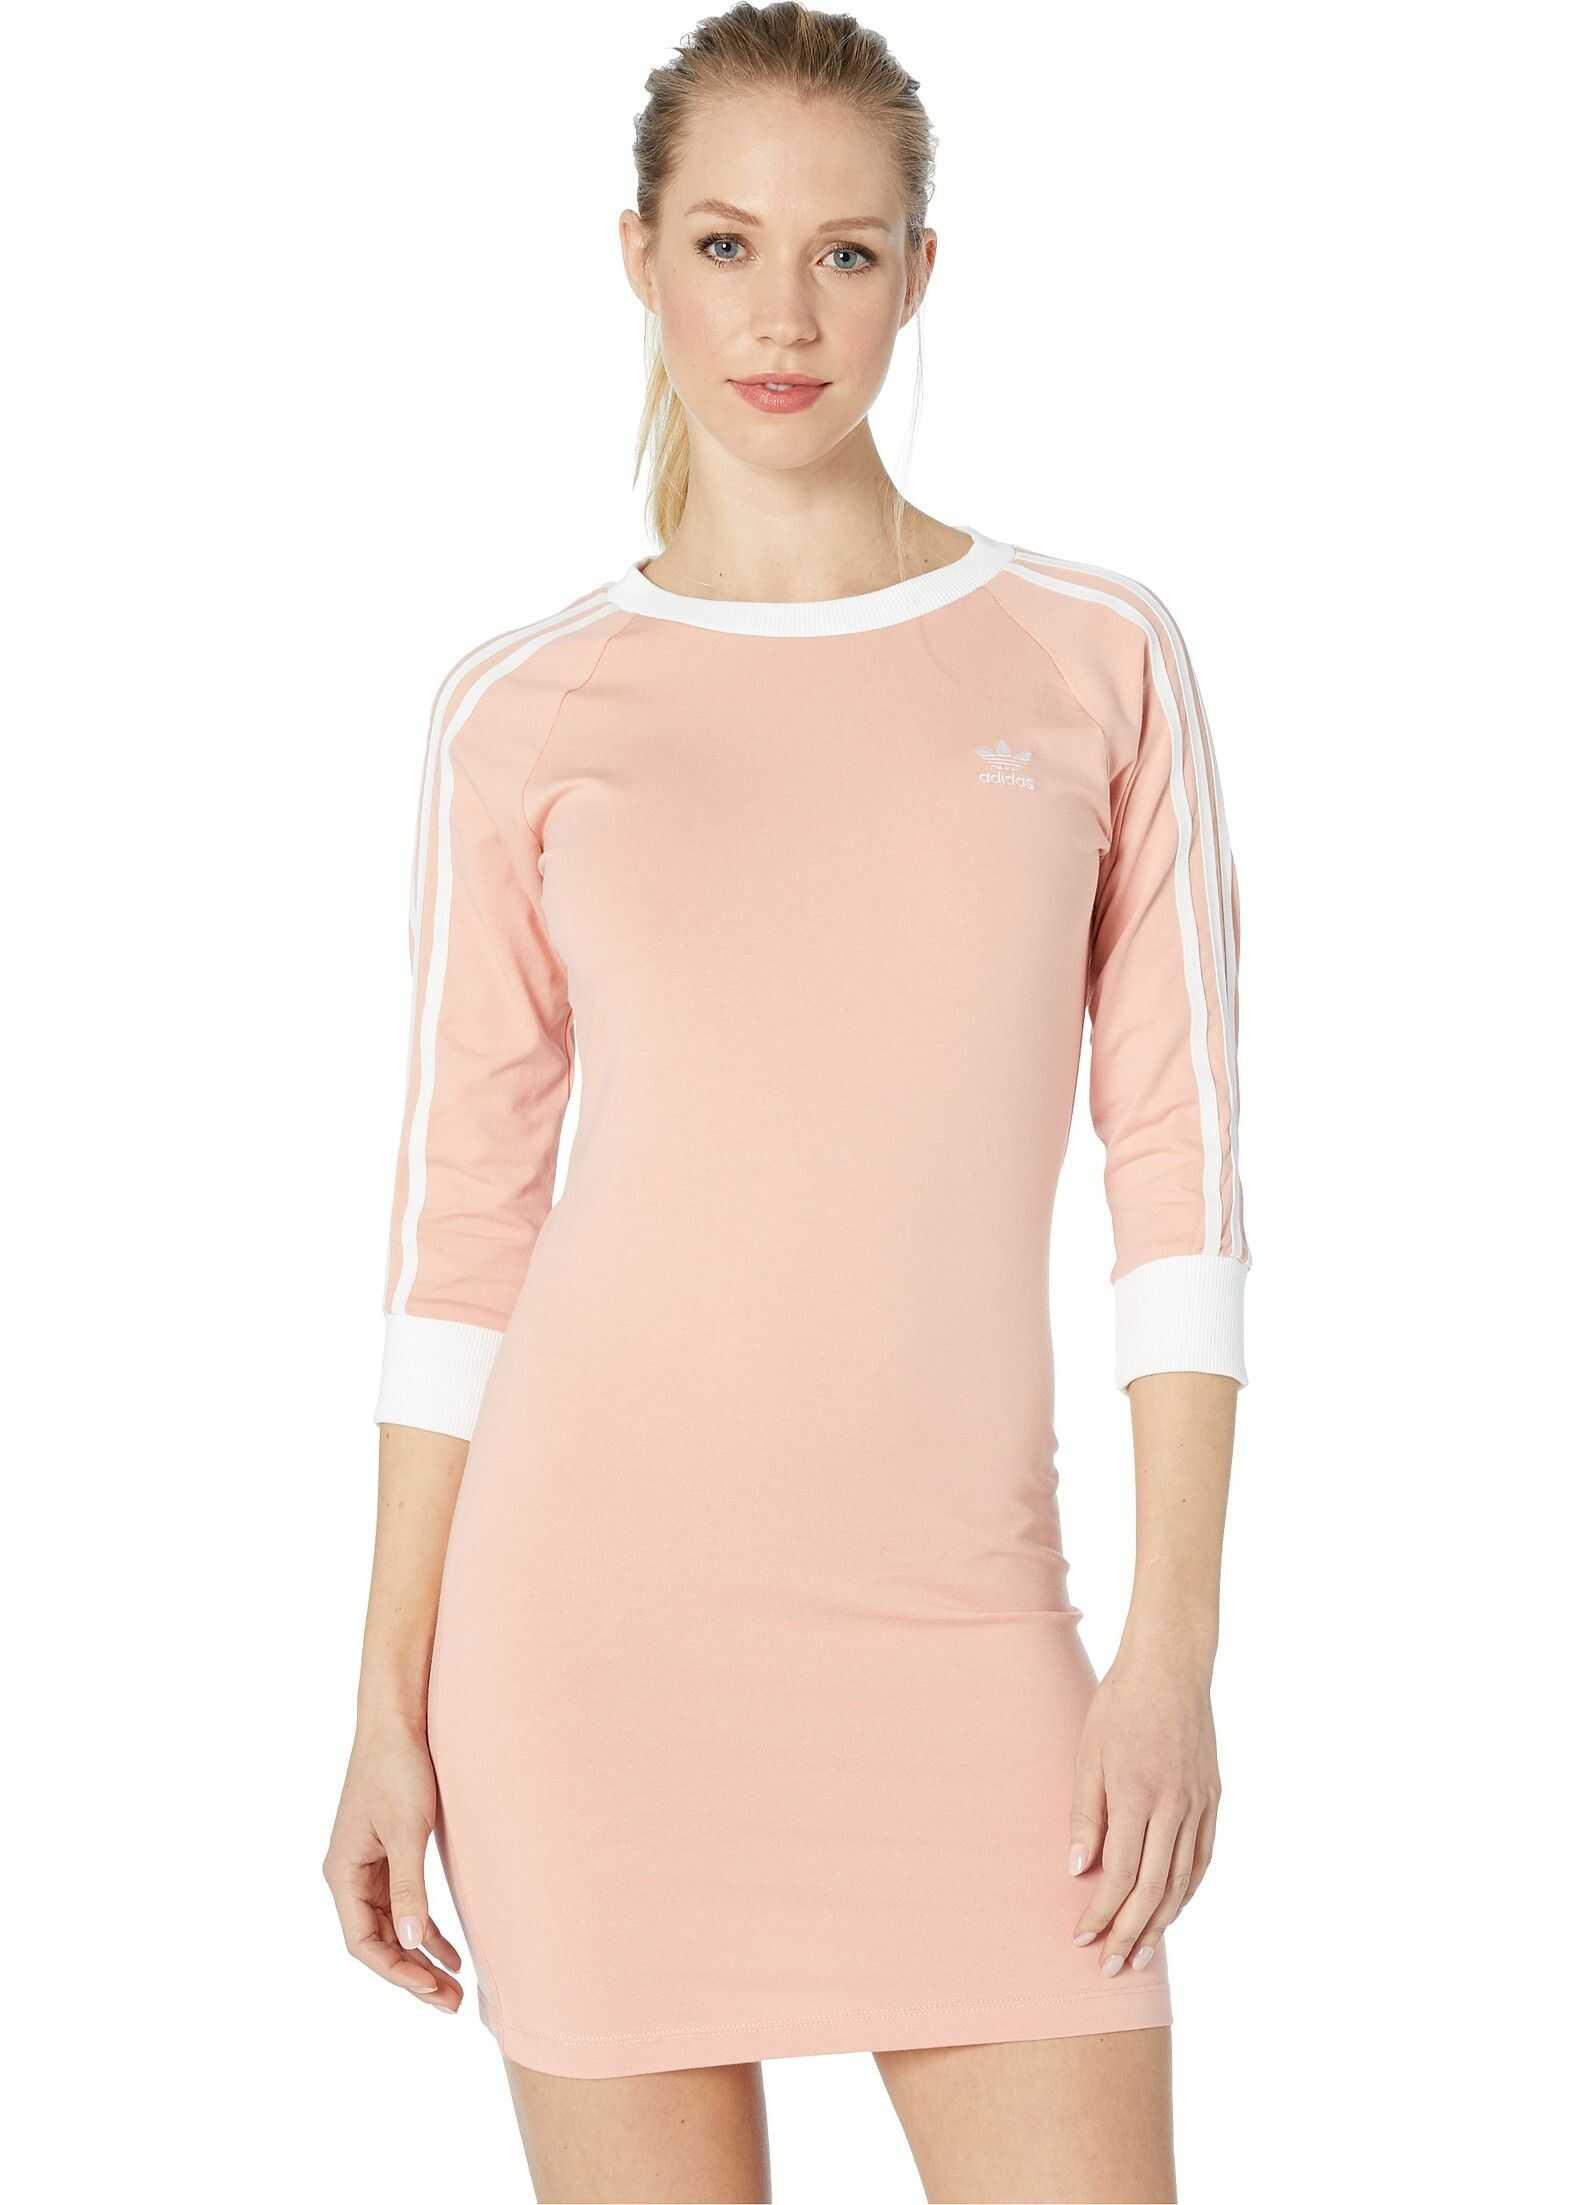 adidas Originals 3-Stripes Dress Dust Pink